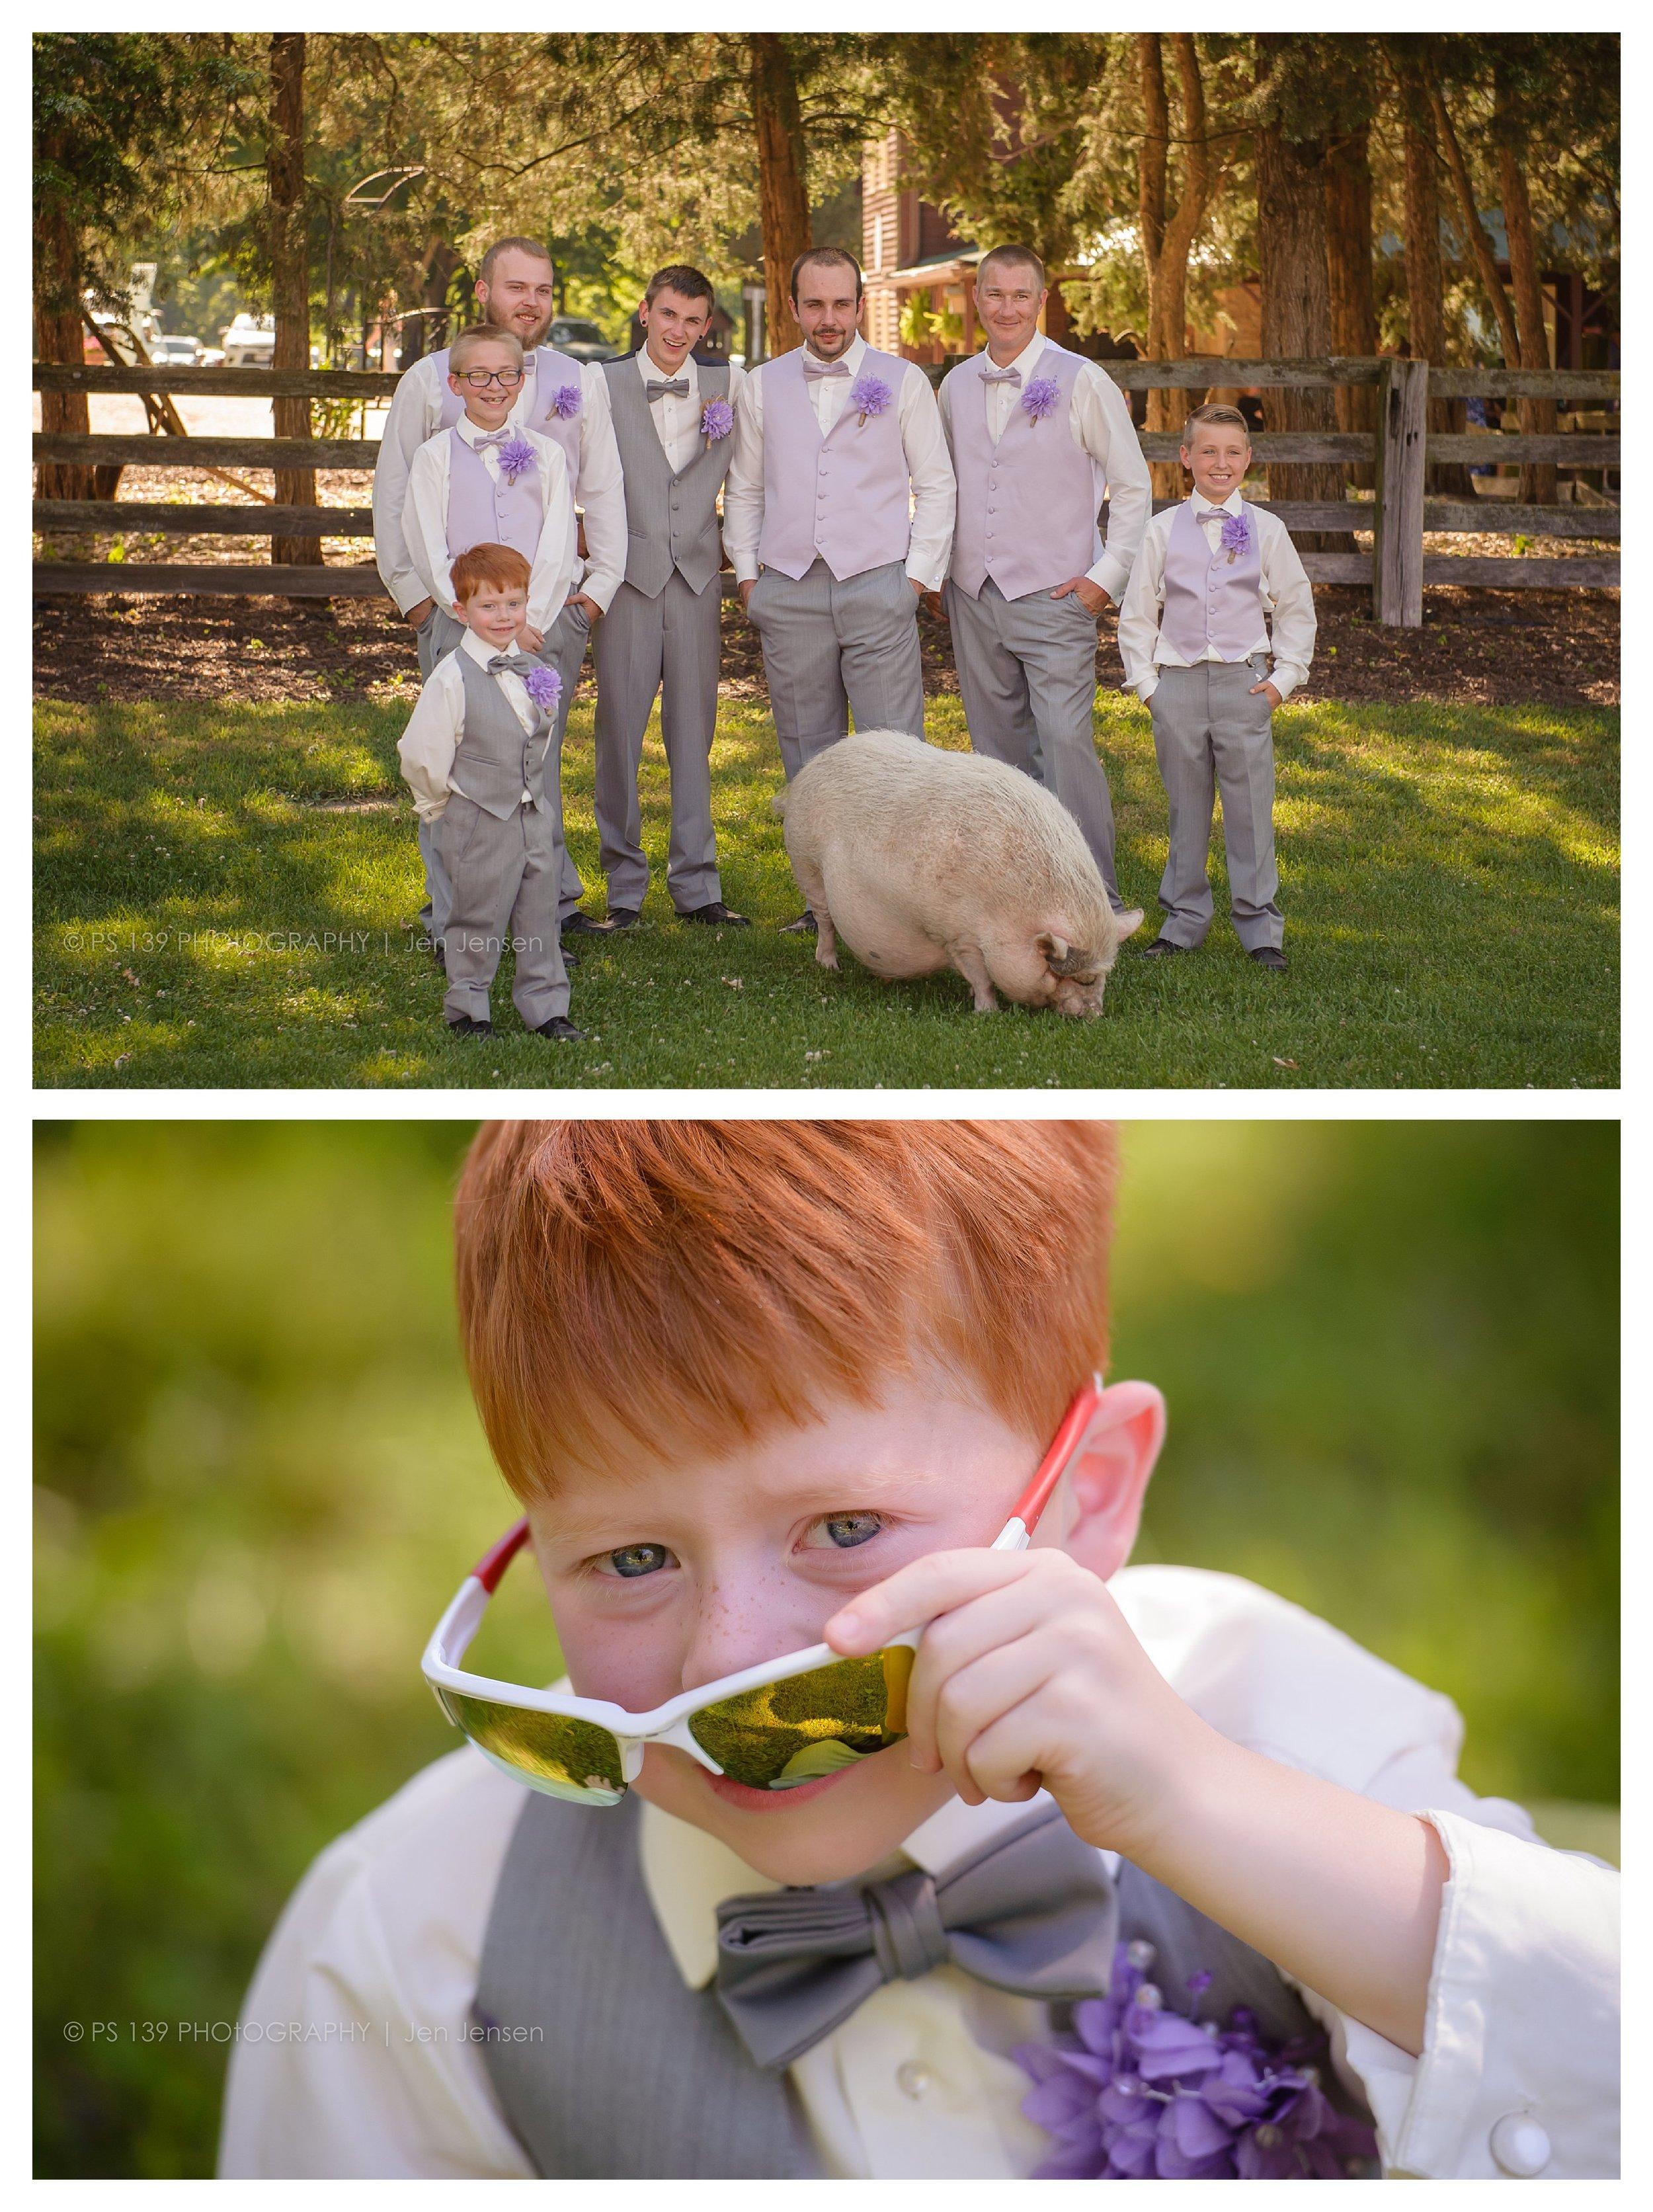 oregon Illinois oak lane farm wisconsin wedding photographer bayfield wi ps 139 photography jen jensen_0262.jpg